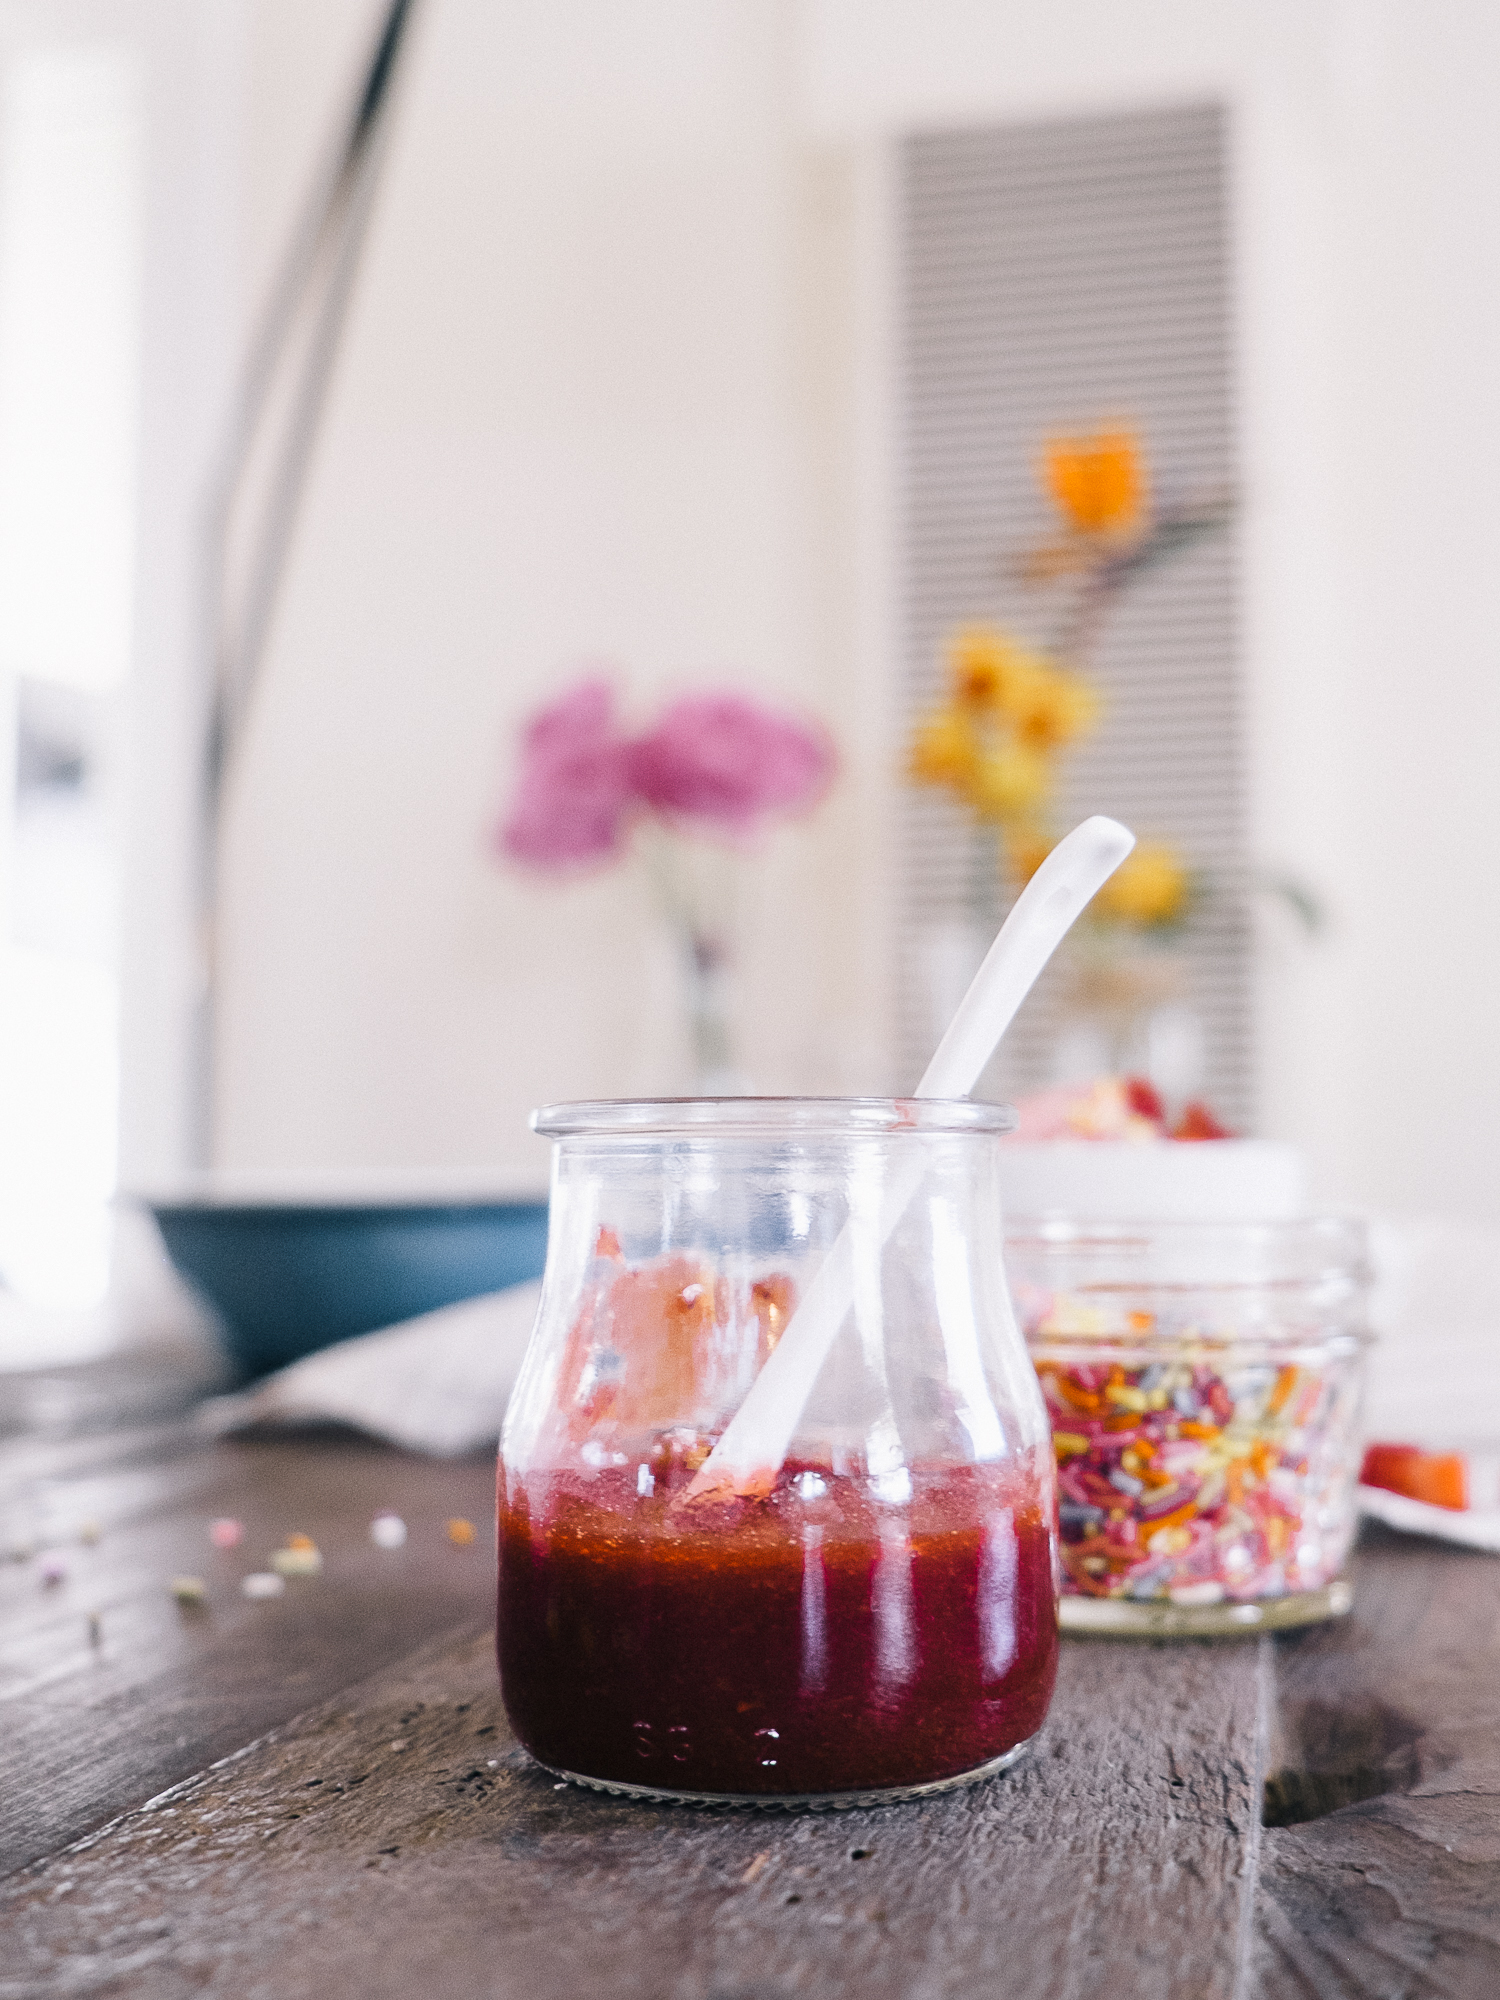 strawberry-balsamic-goat-milk-froyo-30.jpg